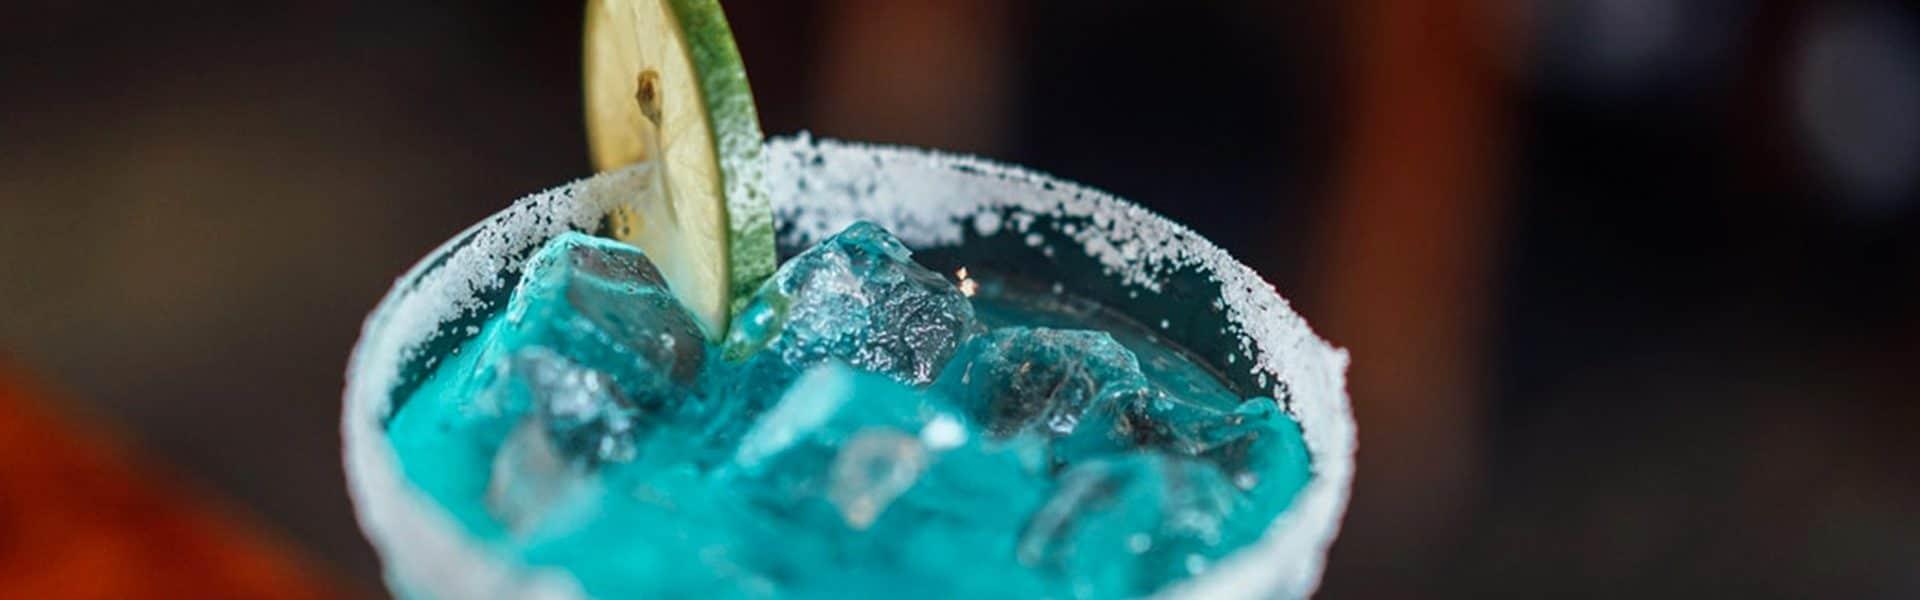 bebidas-azuis-capa